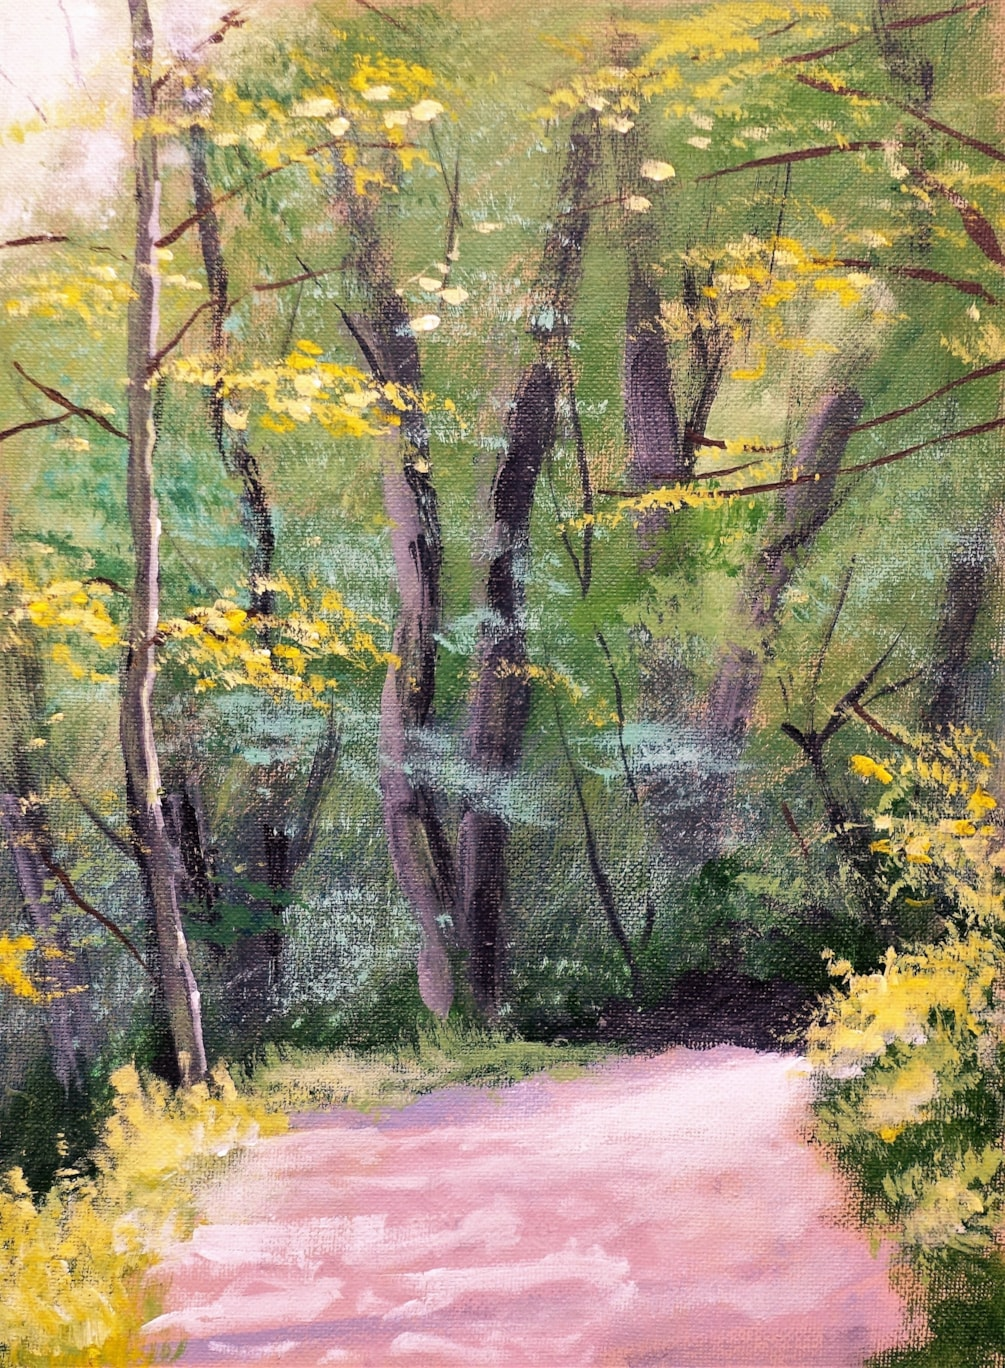 Path through wood